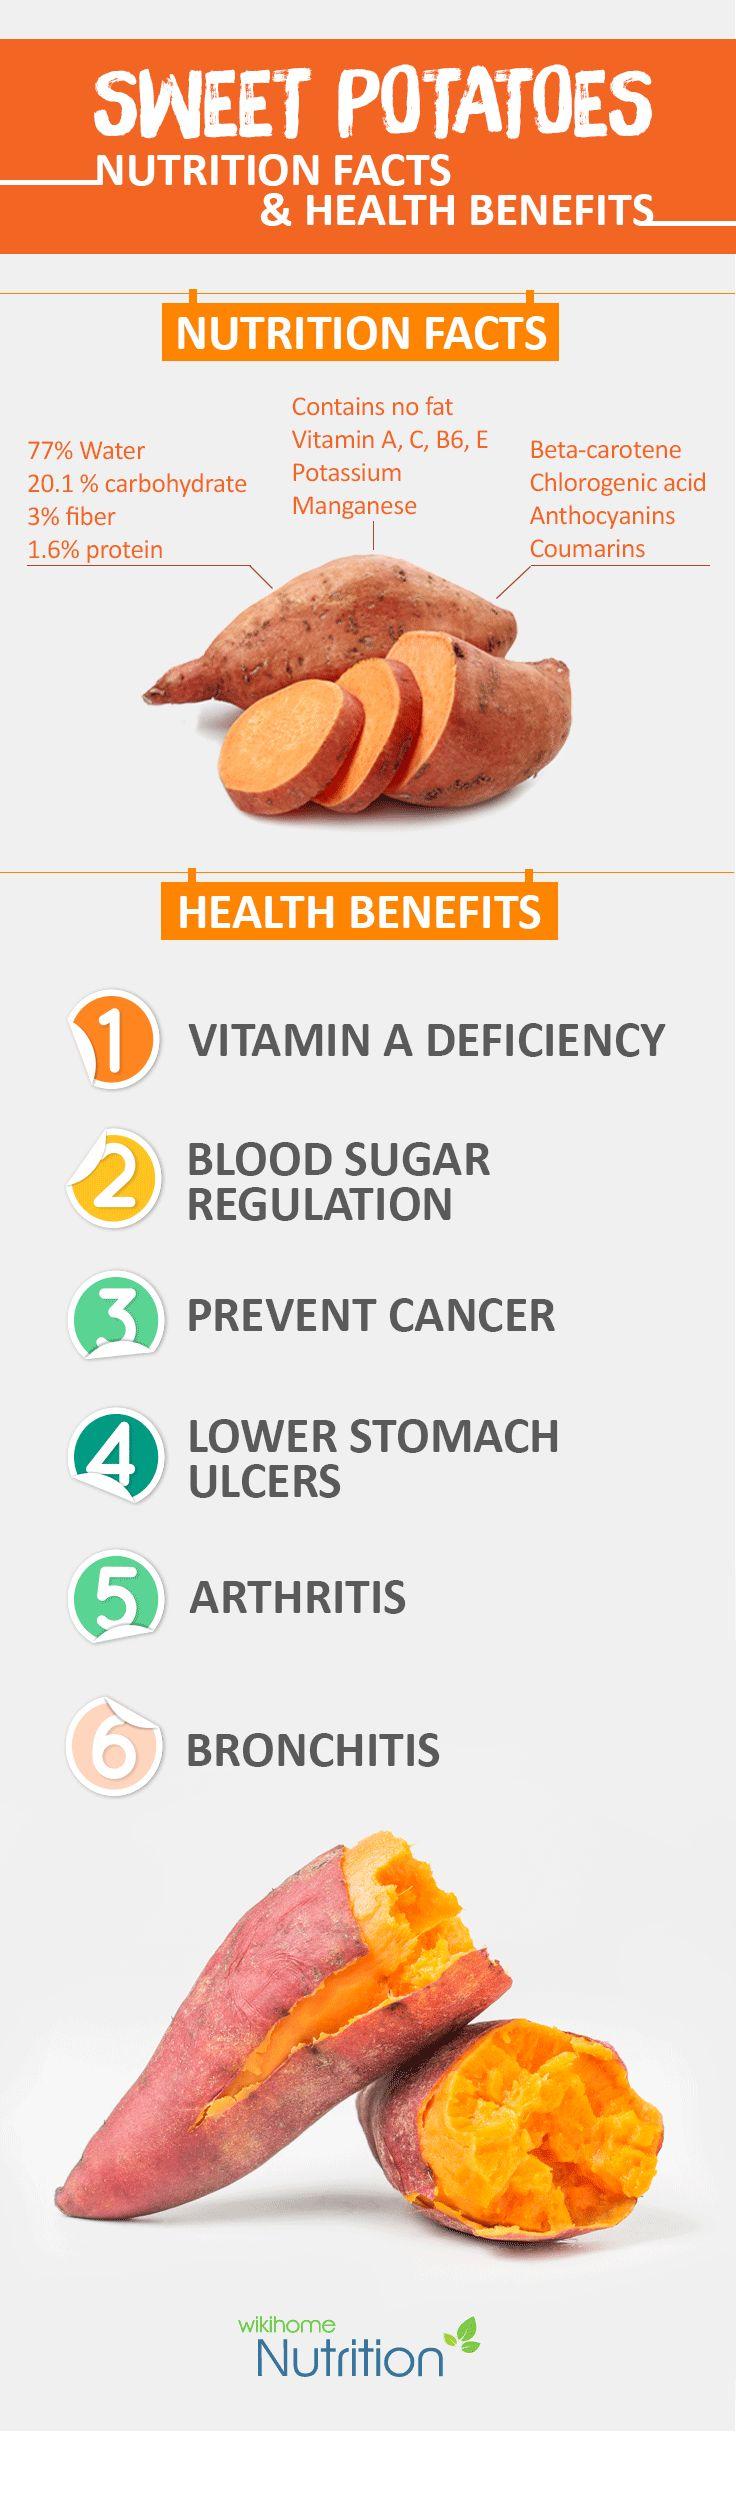 879 best healthy plant based food knowledge images on pinterest health benefits of sweet potatoes health sweetpotatoes forumfinder Gallery